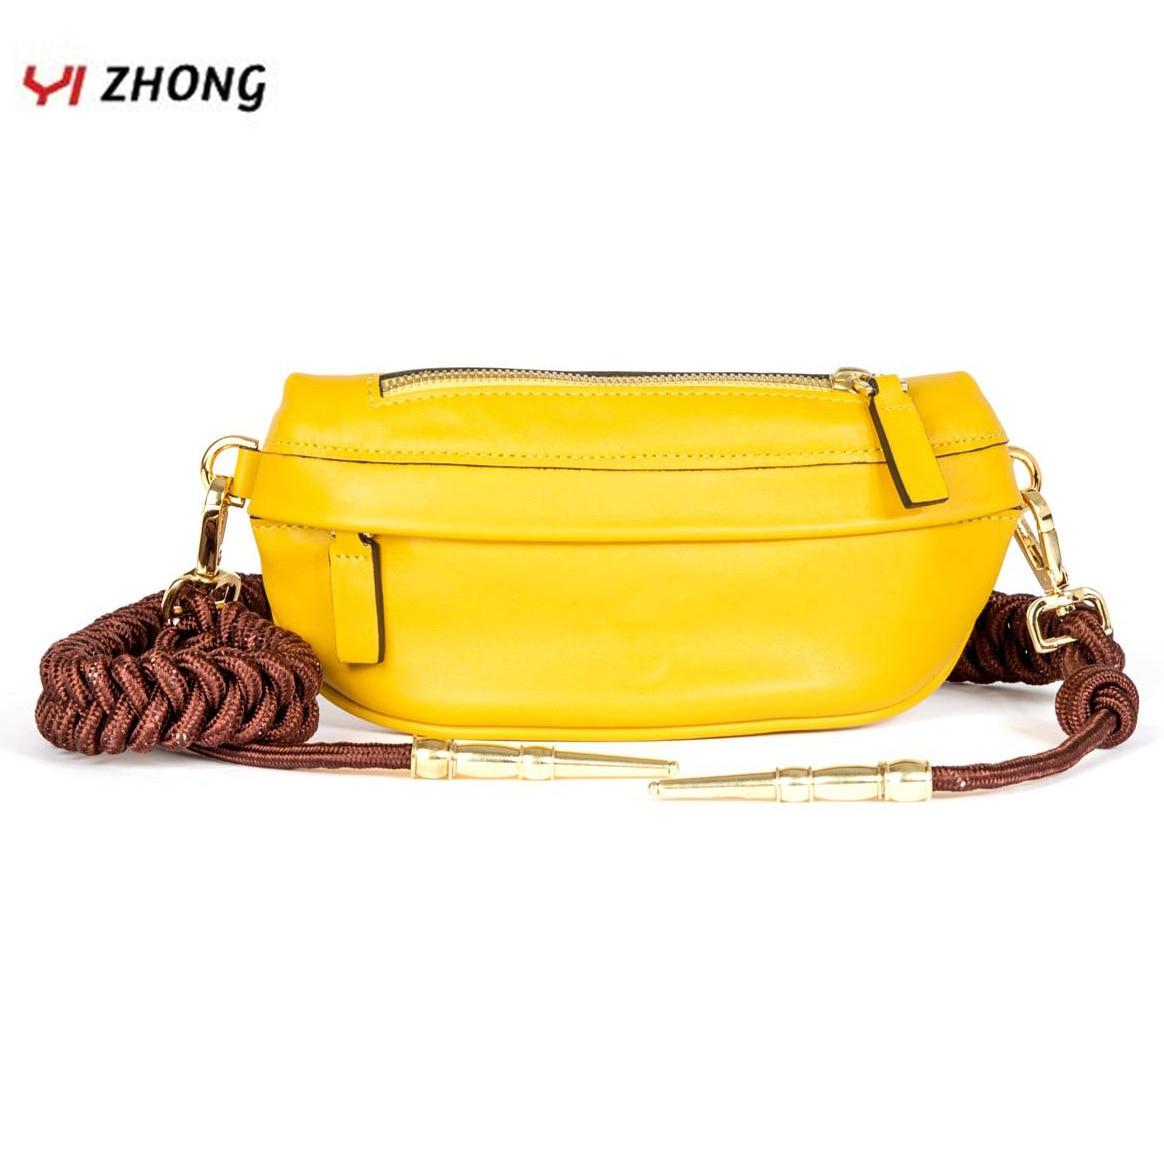 NEW Arrival Fashion Waist Belt Bag Fanny Crossbody Chest Bags Luxury Handbags Women Bags Designer Small W